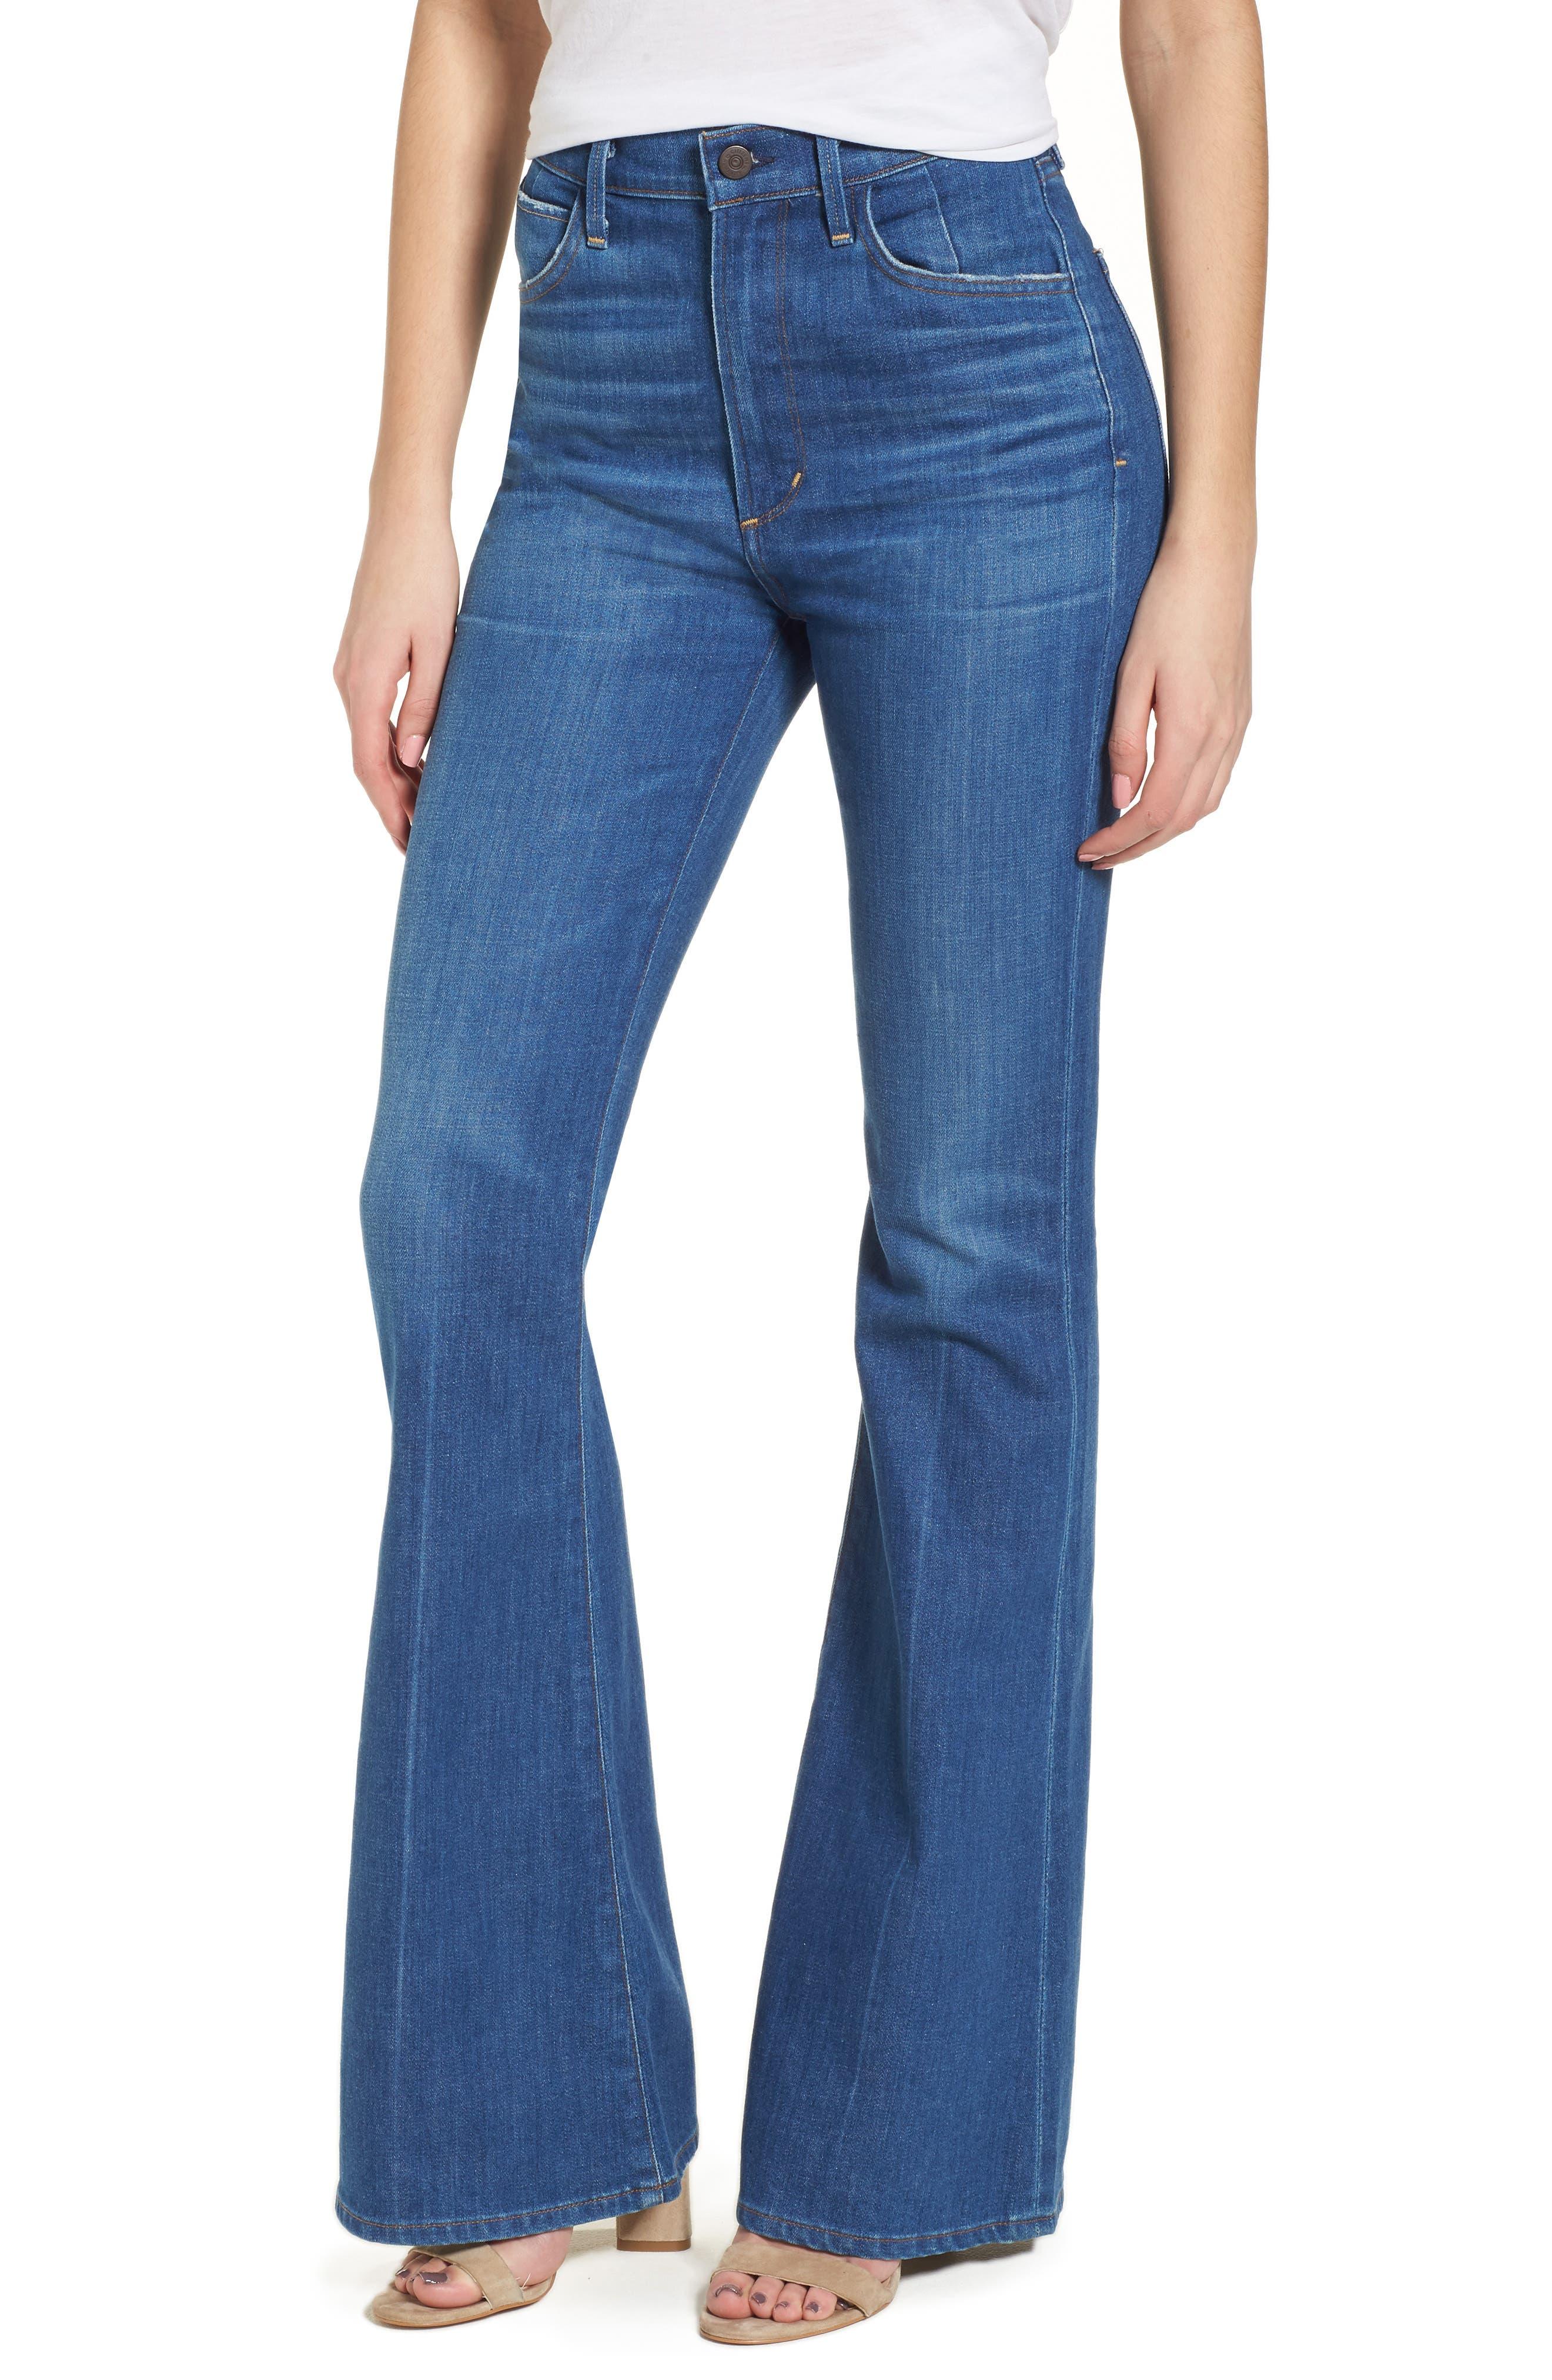 Cherie High Waist Bell Jeans,                         Main,                         color, Frampton